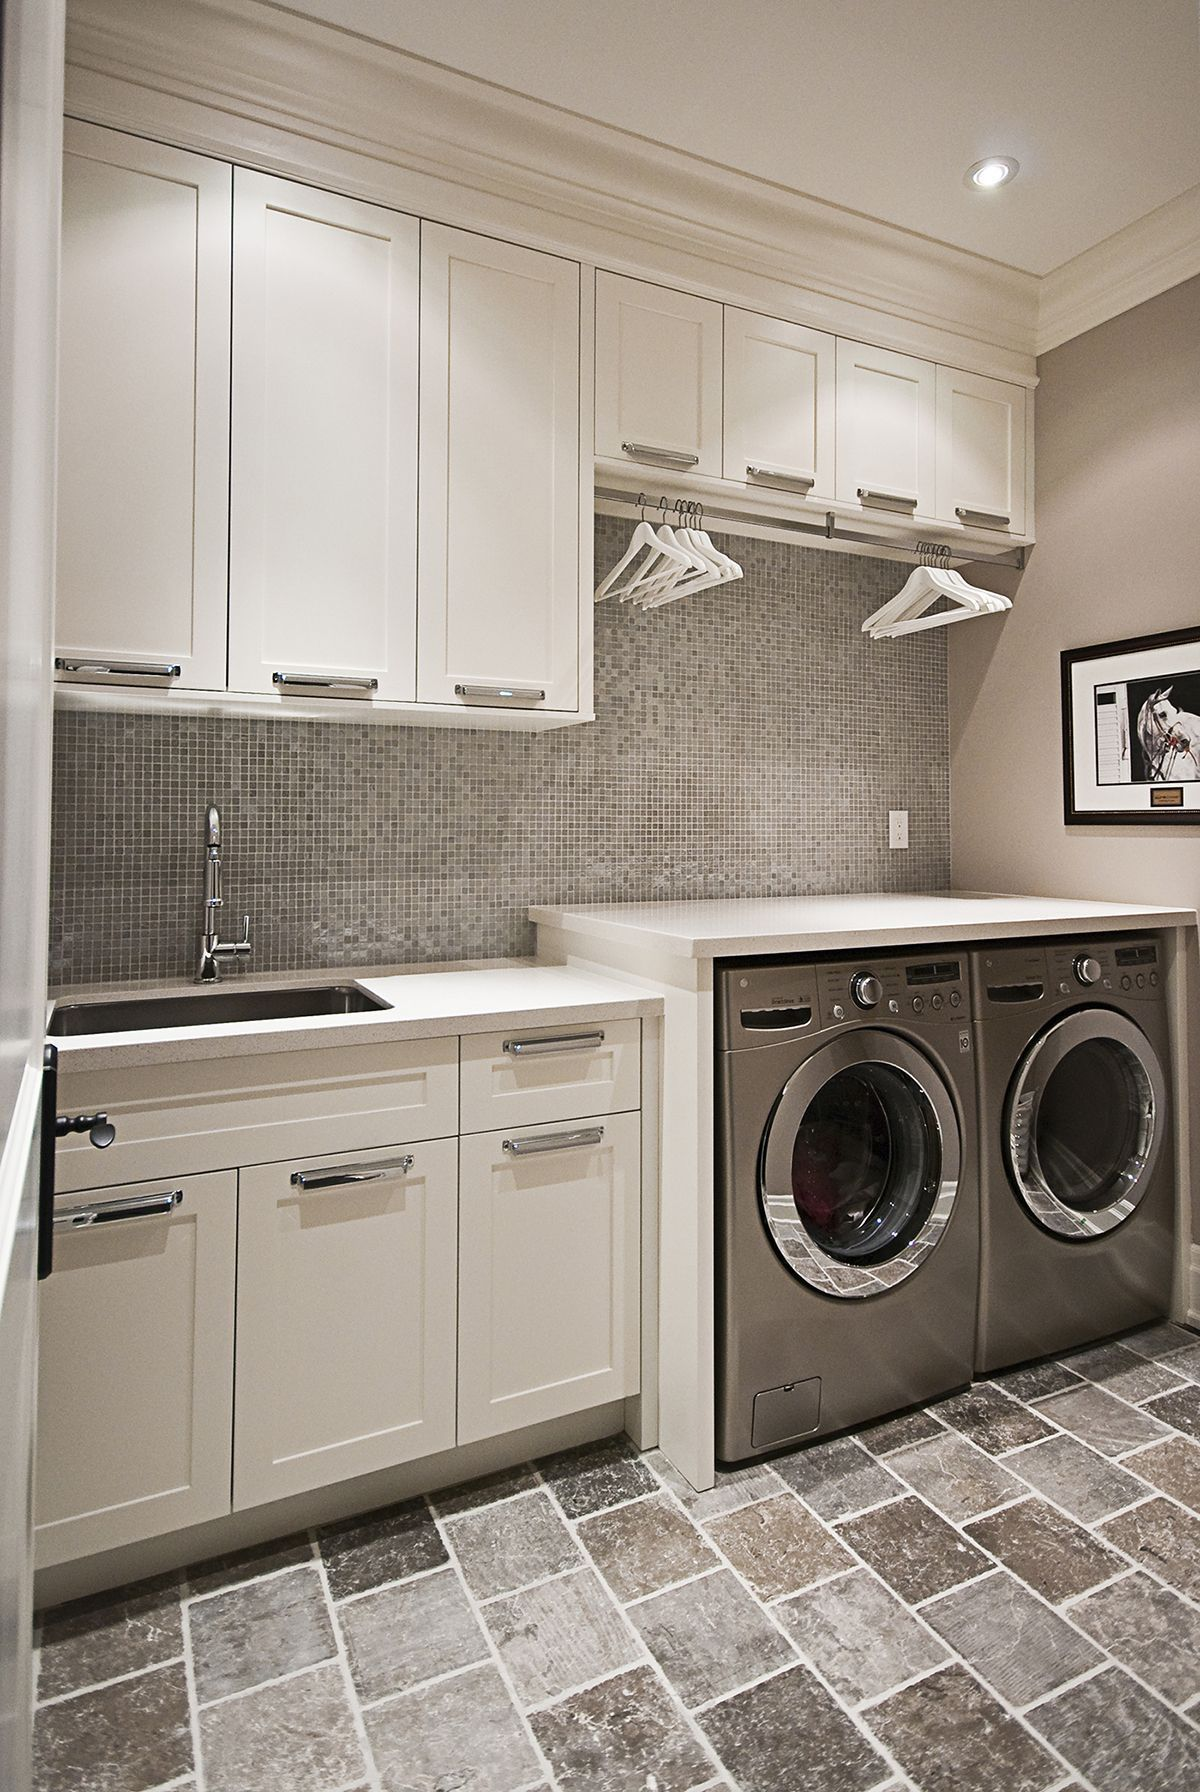 Design Laundry Room Online: Laundry Room Design, Laundry Room